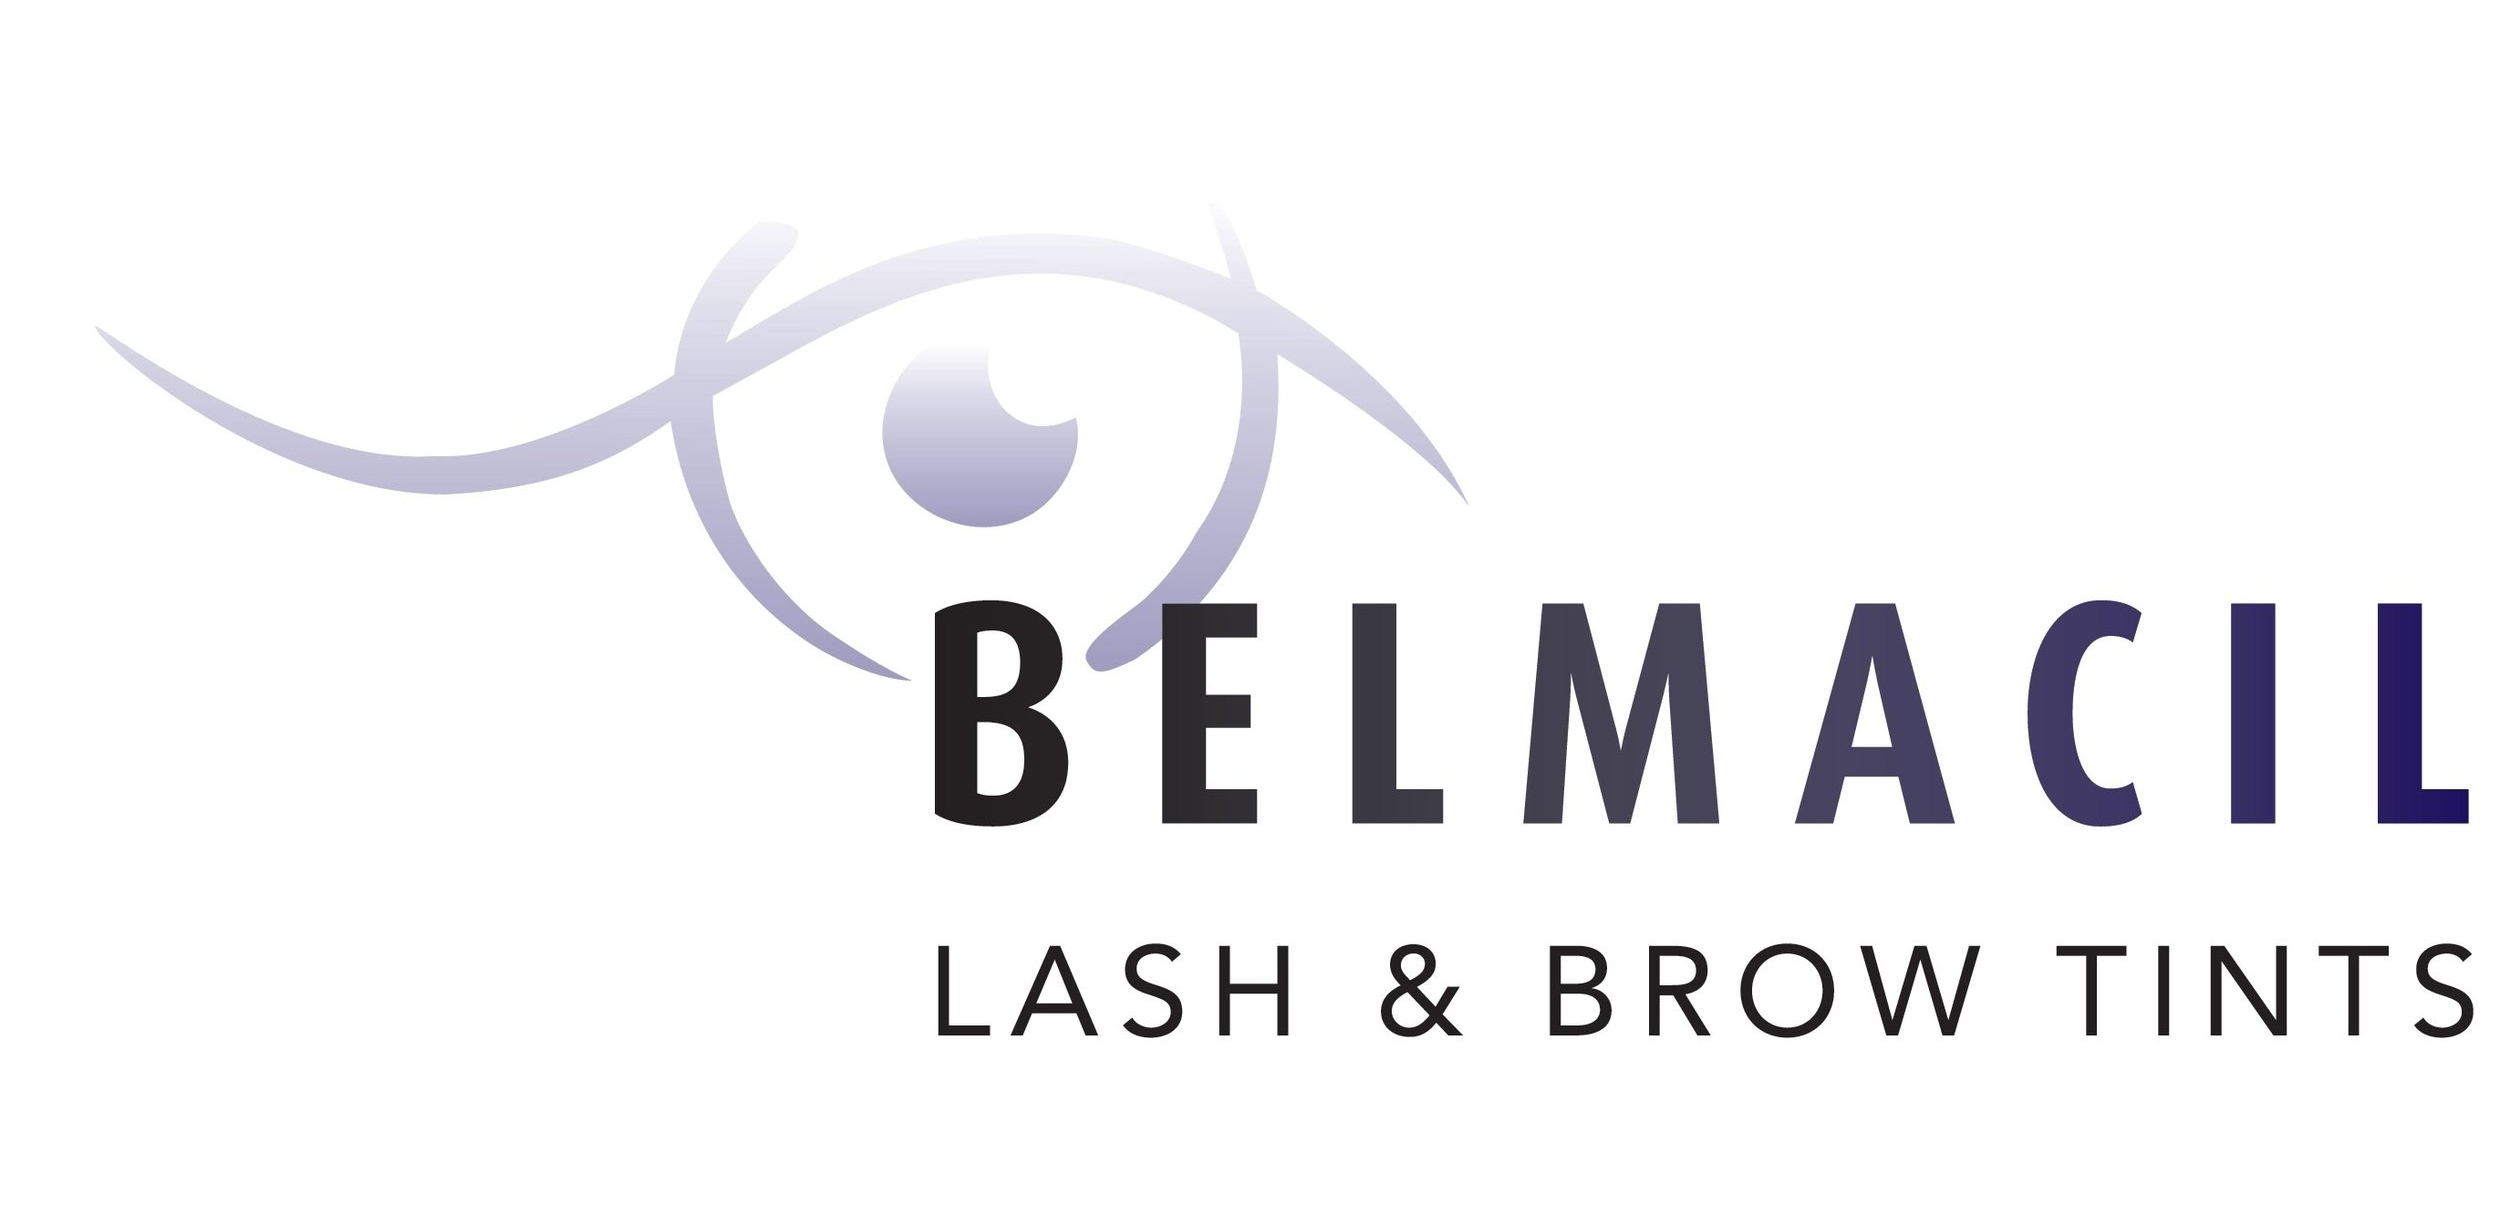 belmacil lash and brow tints.jpg